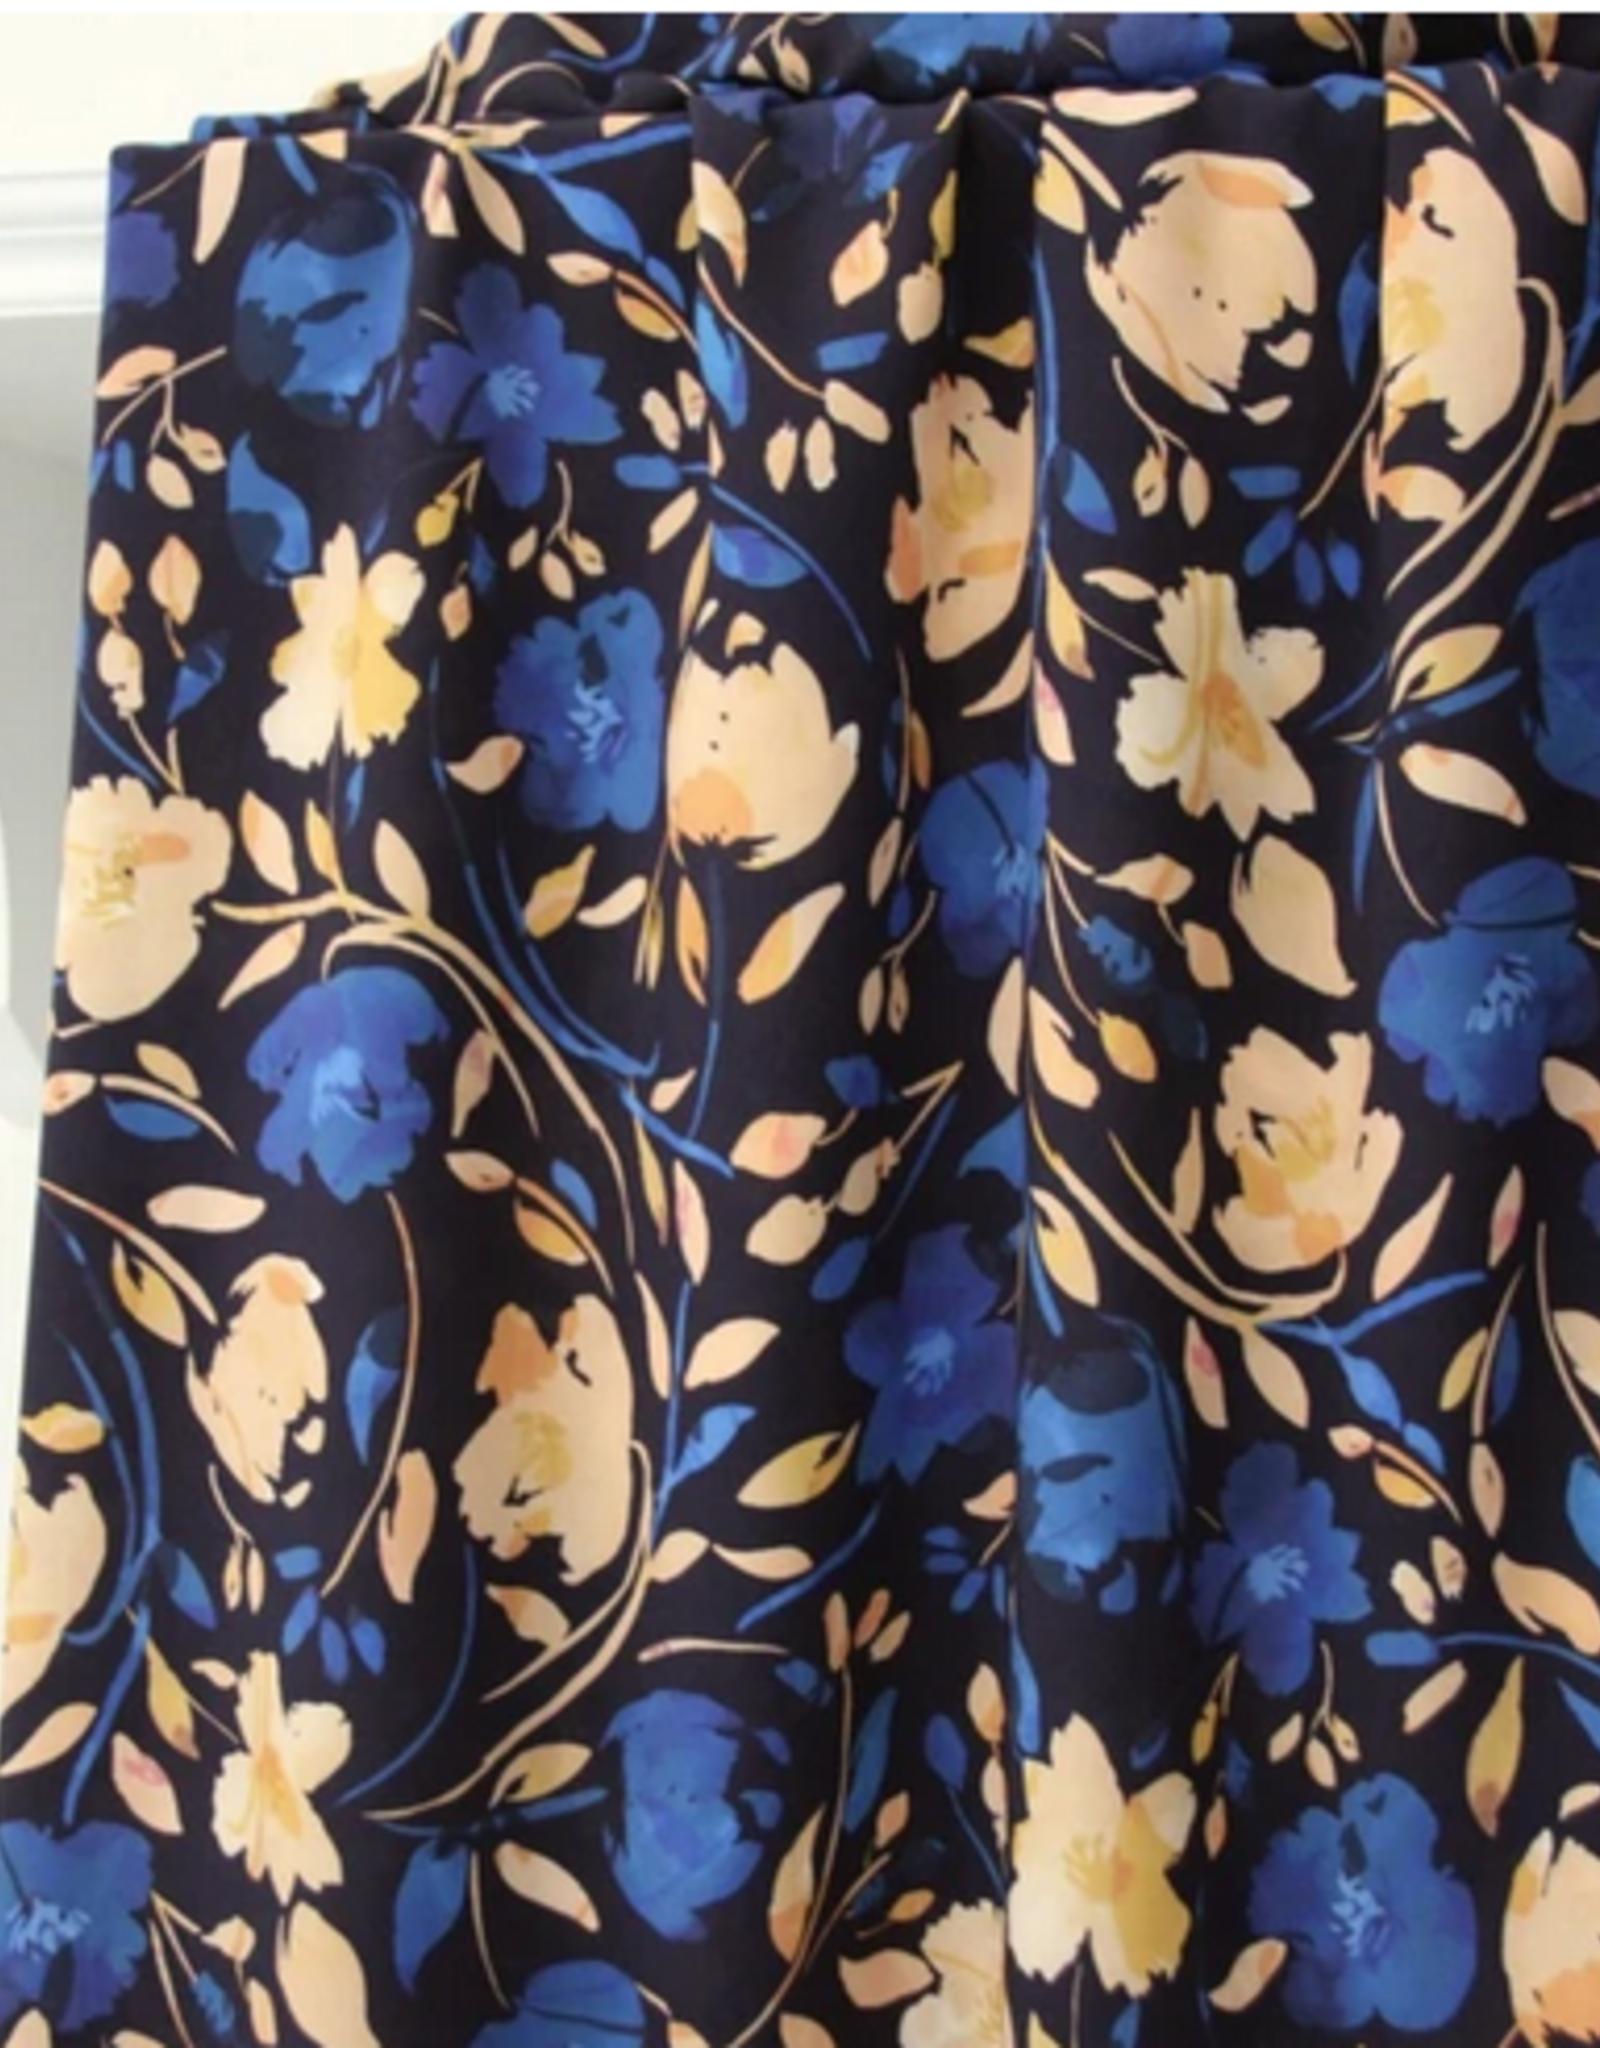 Atelier Jupe Atelier jupe - Donkerblauwe viscose met blauwe en zalmroze bloemenprint